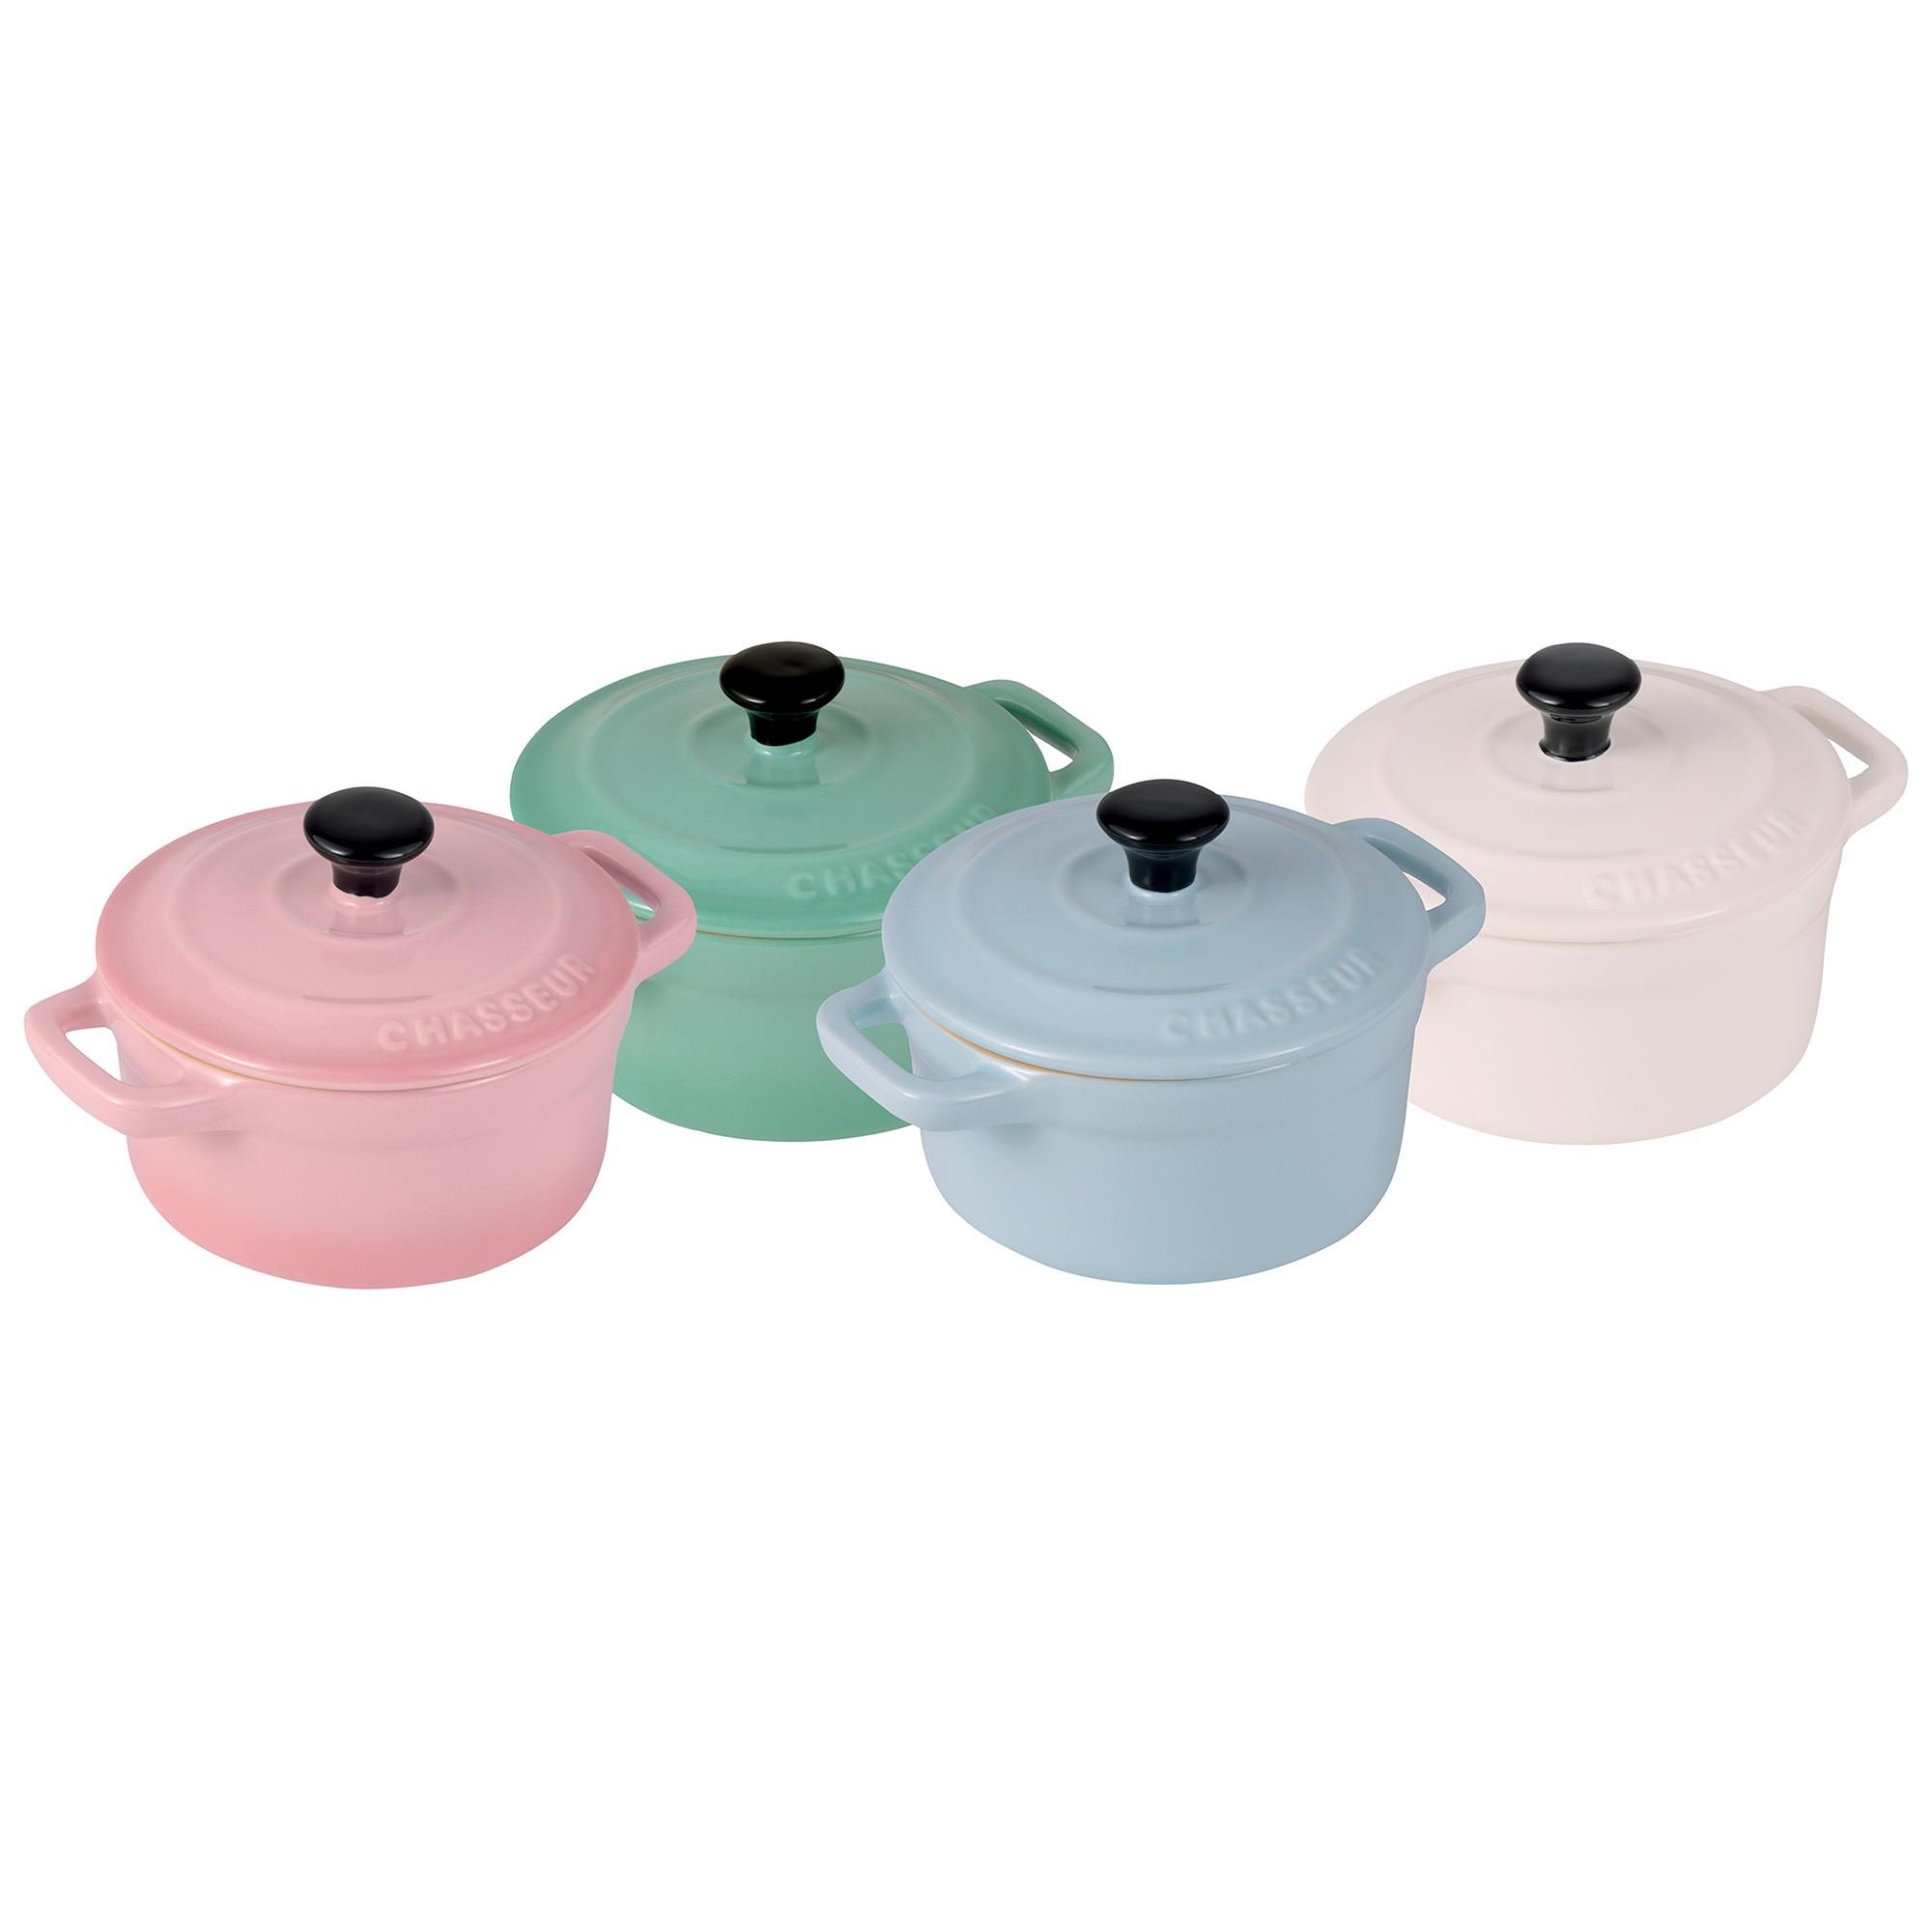 Chasseur Macaron 4 Piece Mini Mini Cocotte Set